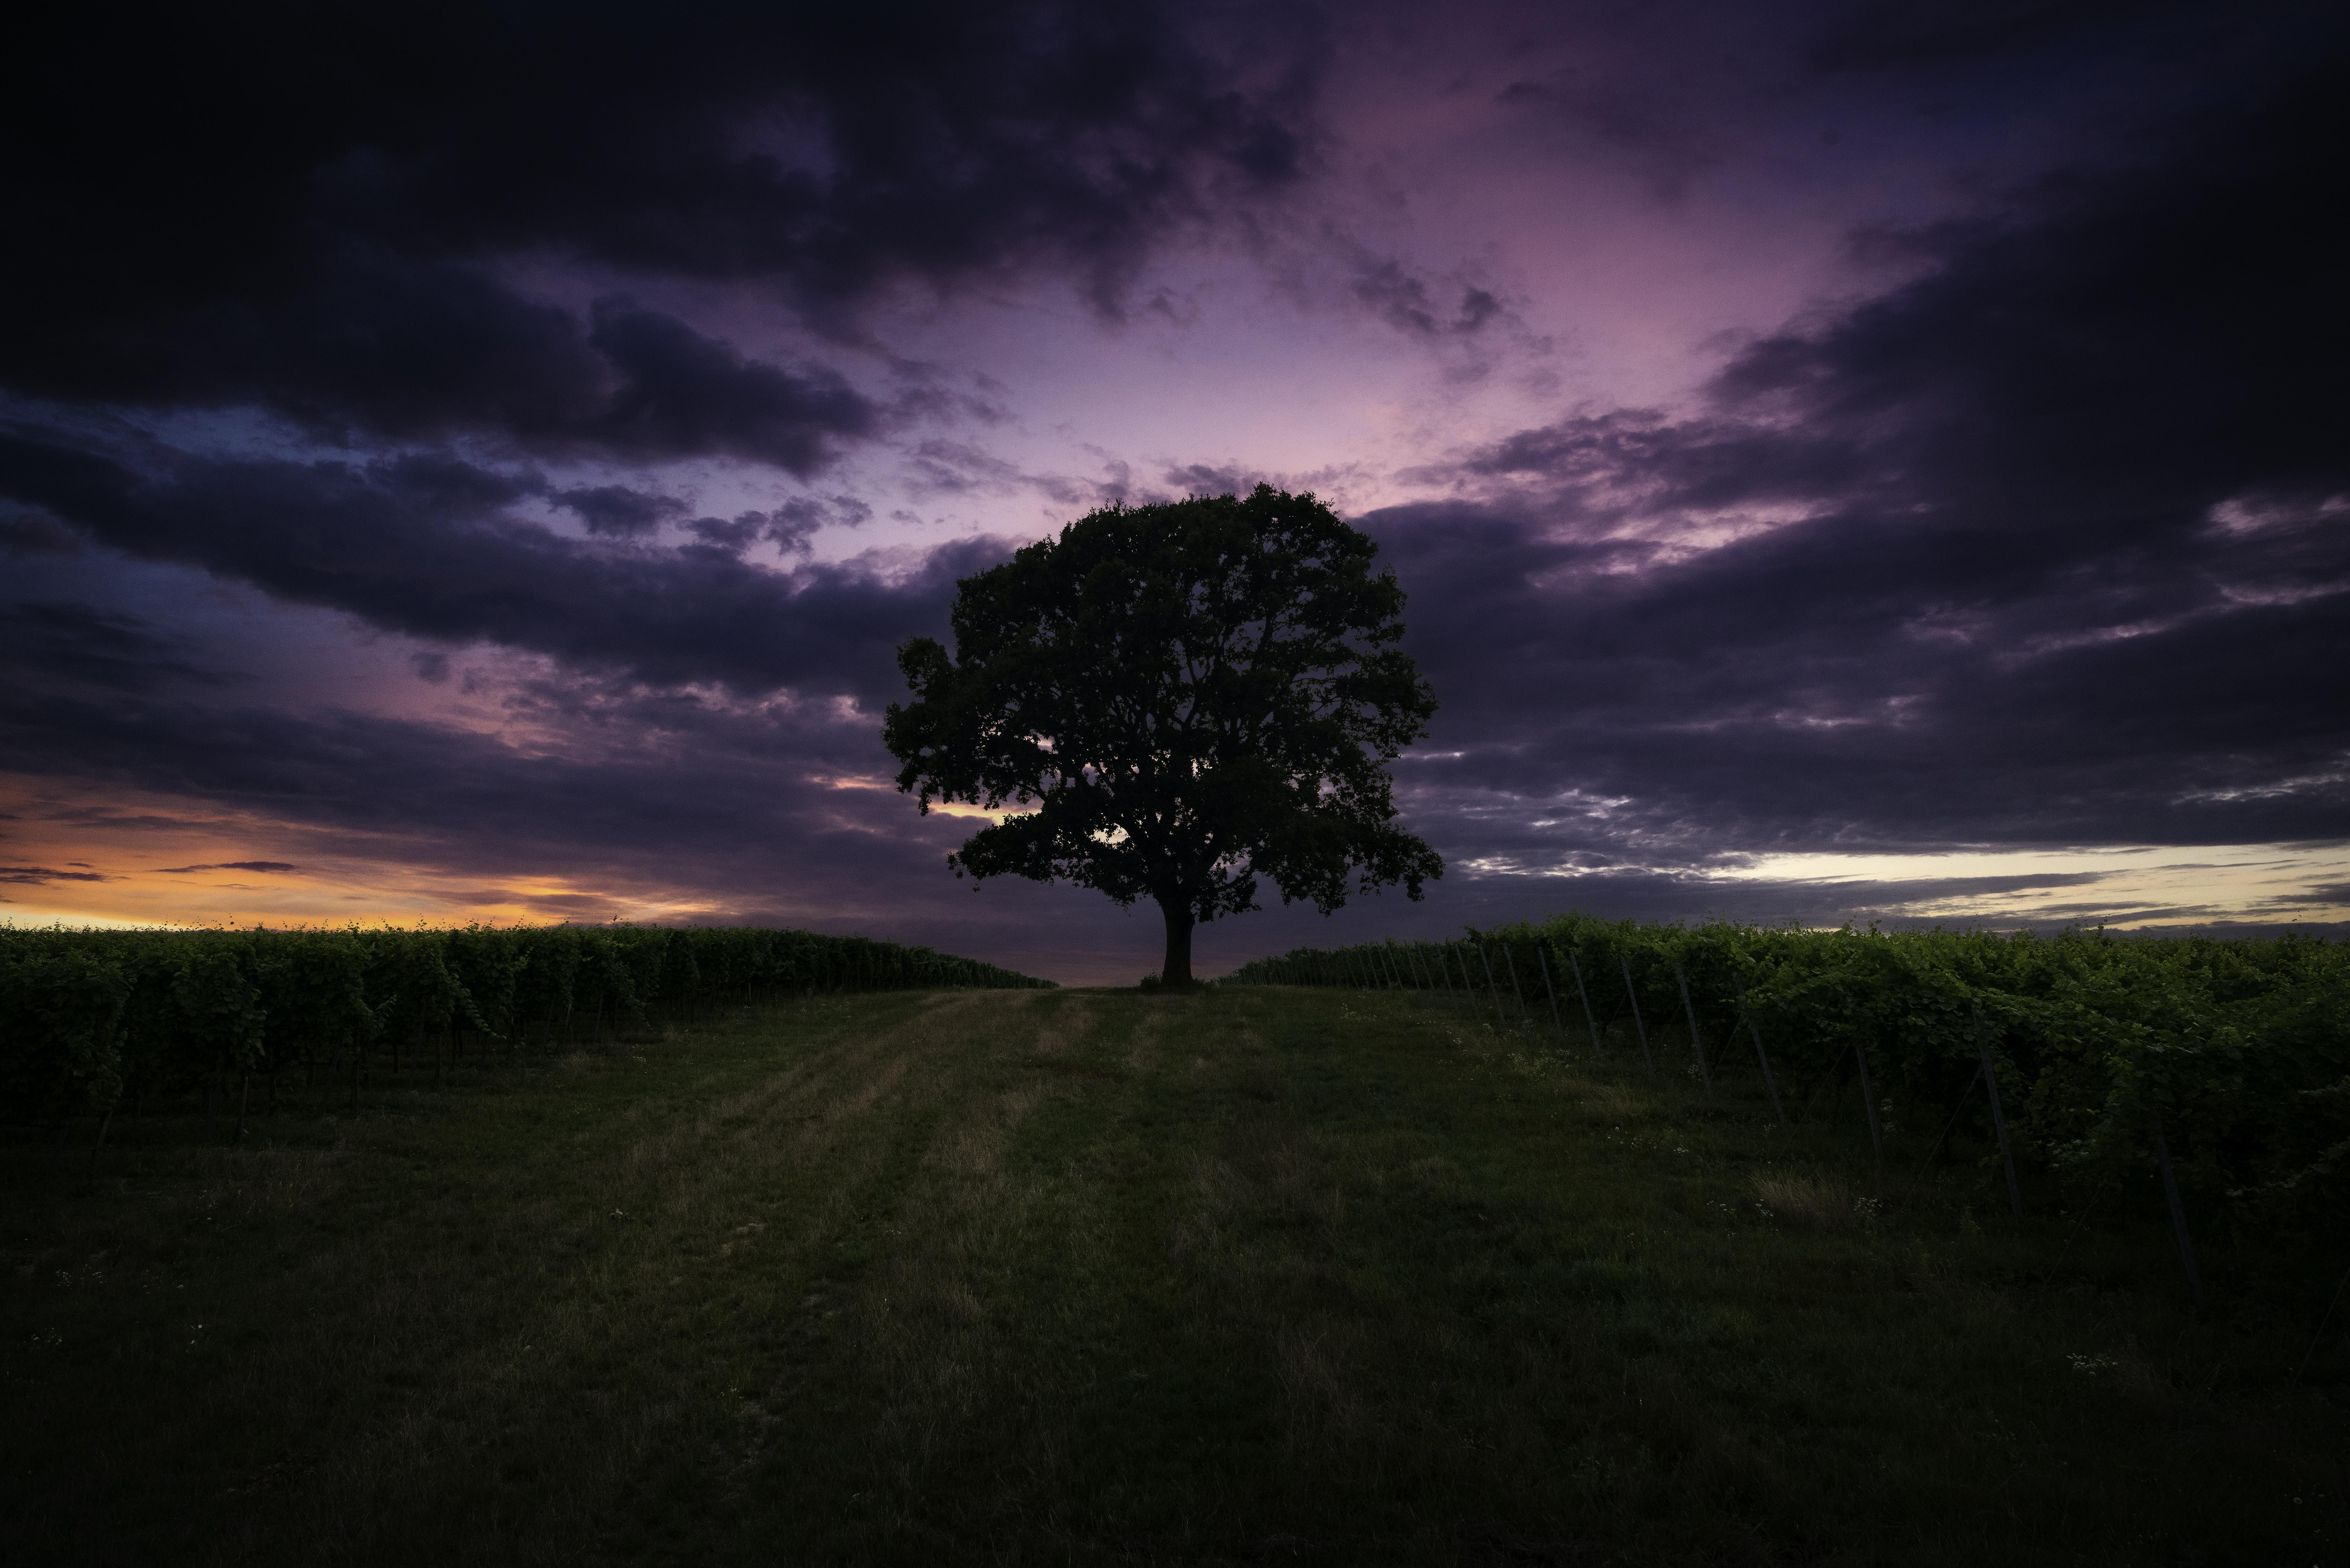 landscape photo of tree